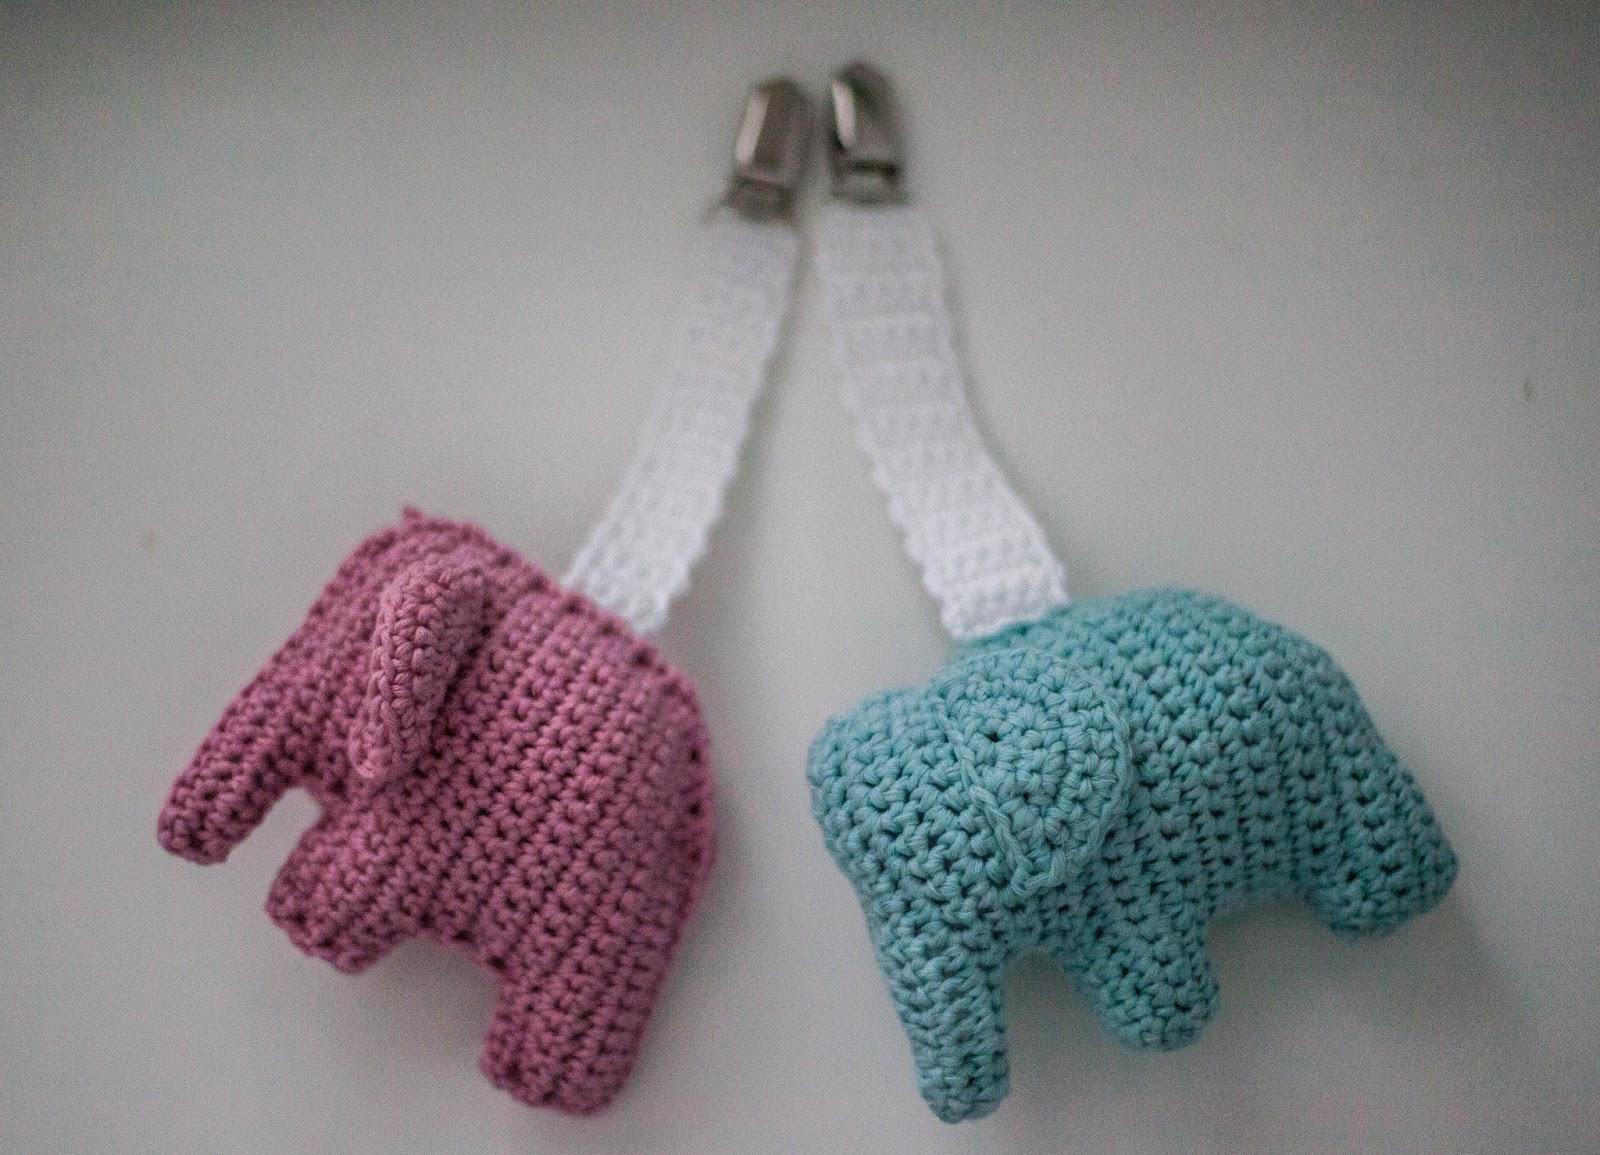 vaunulelu norsu